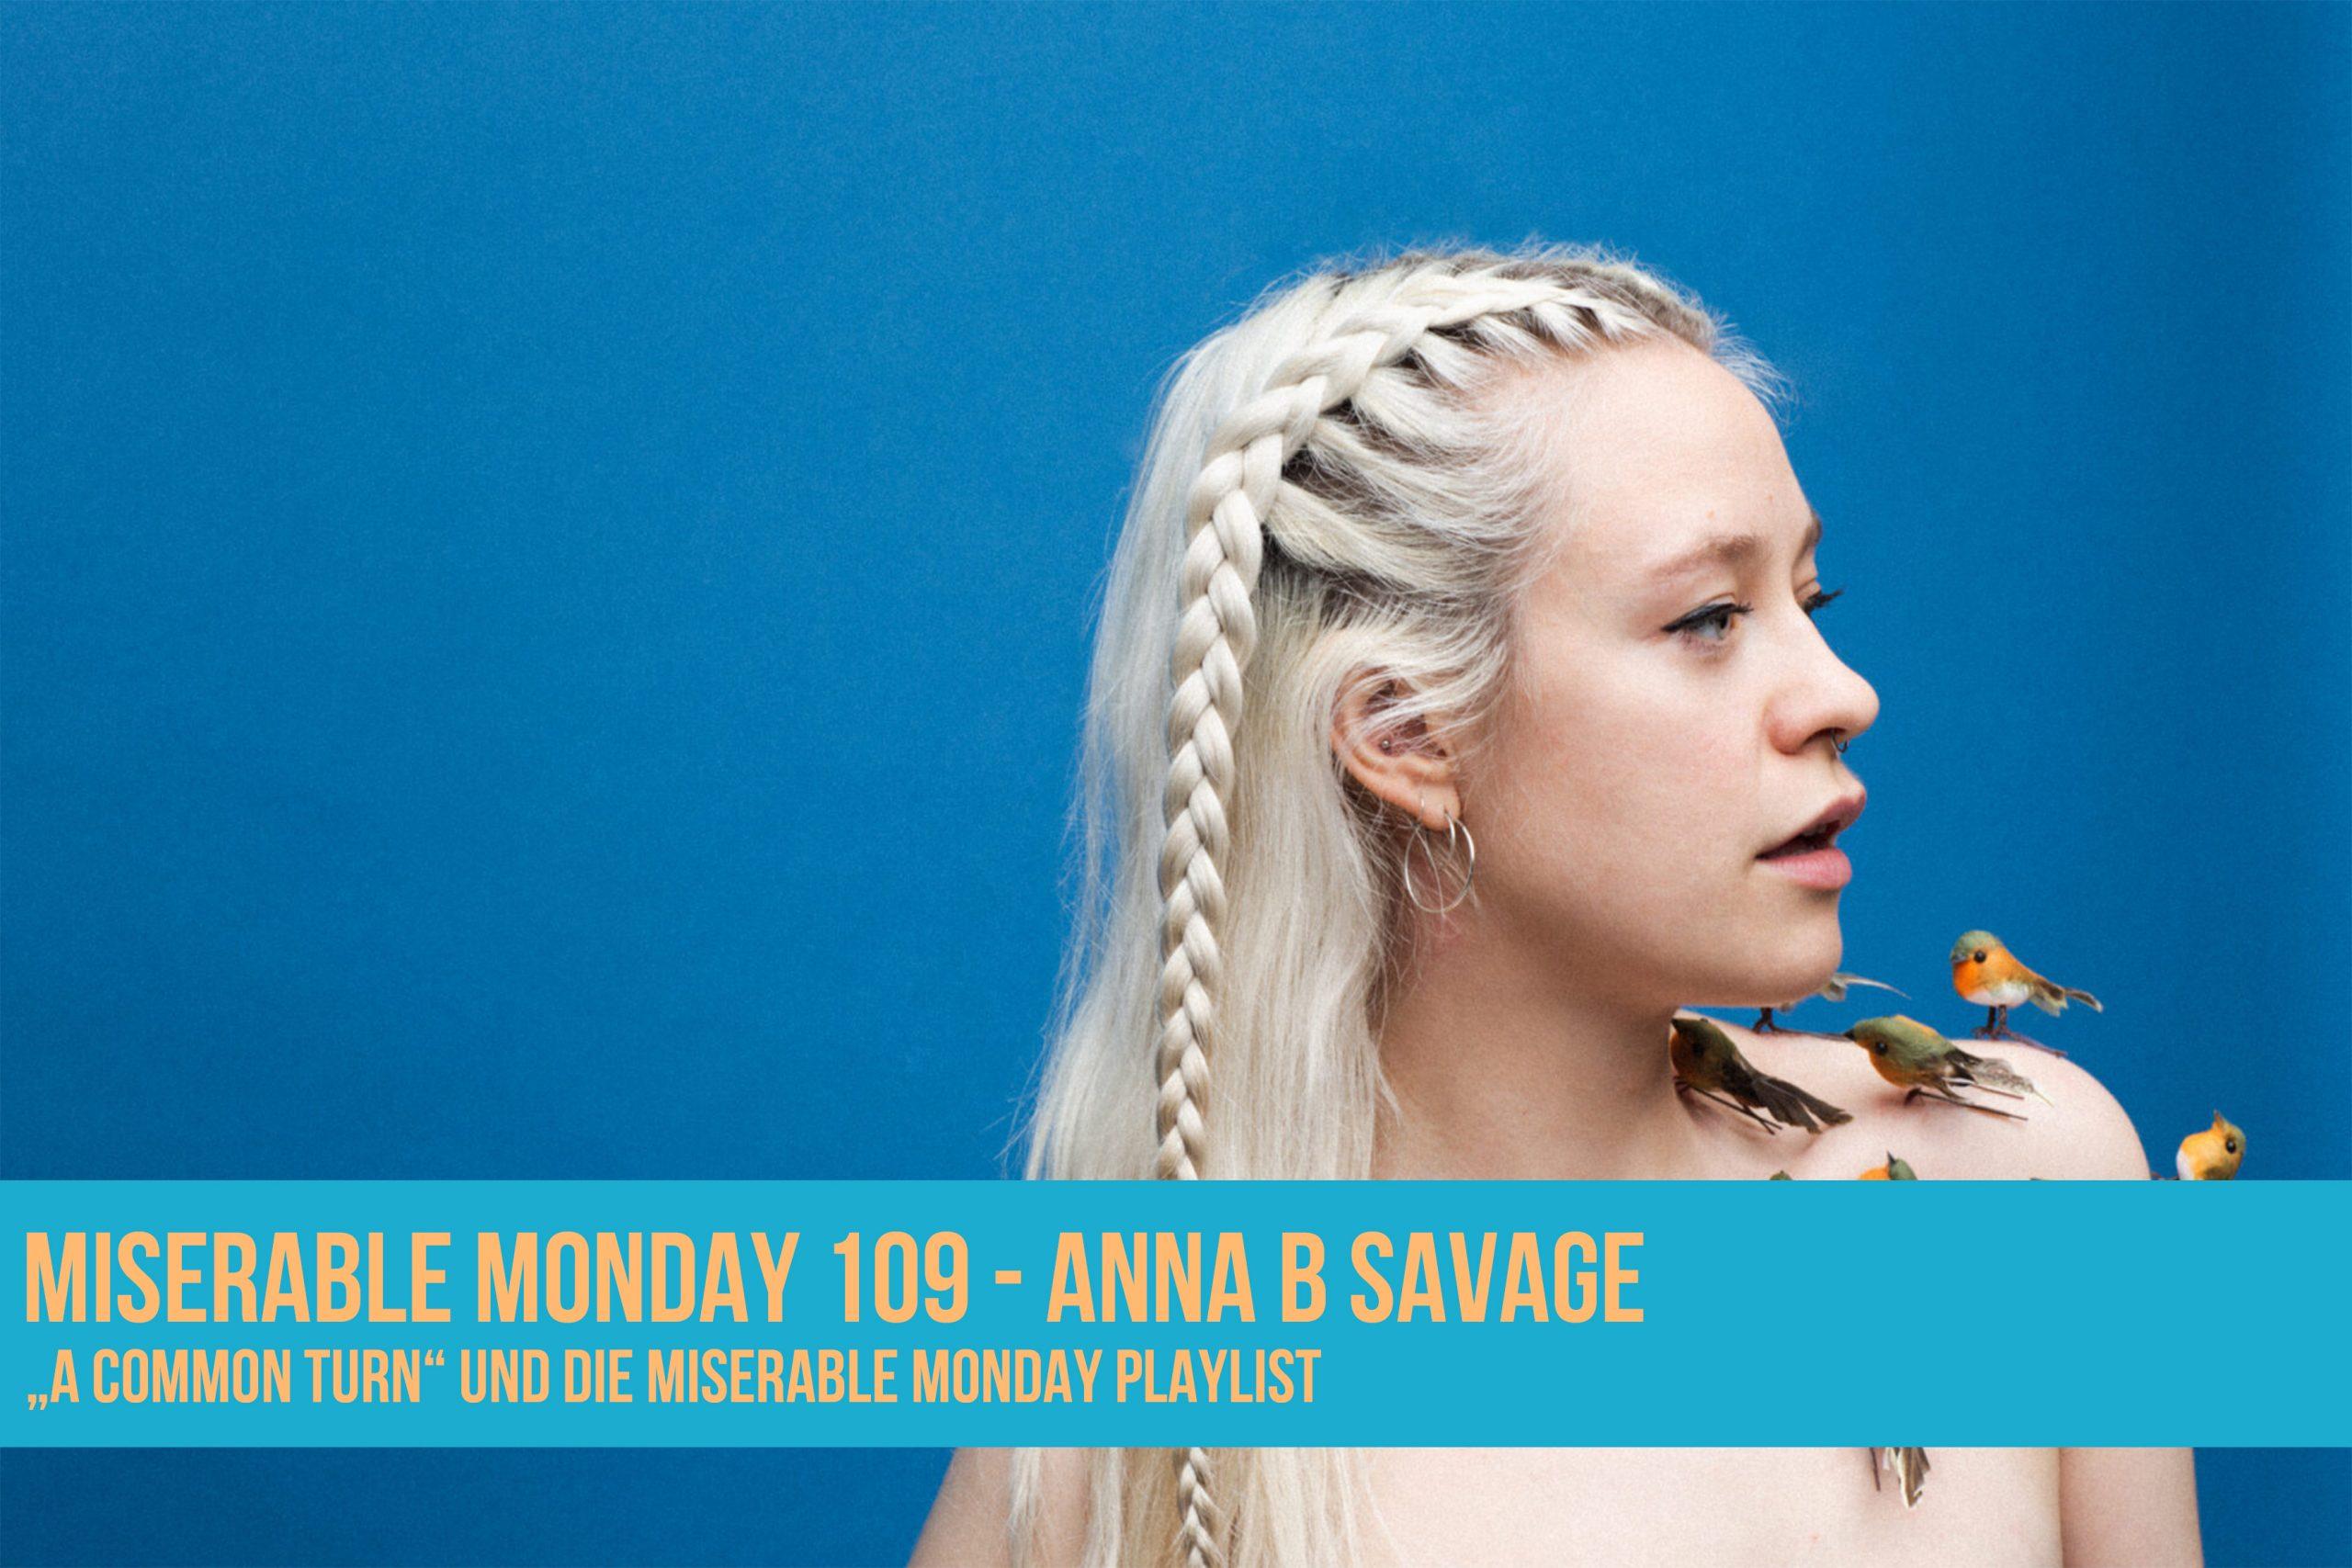 109 - Anna B Savage